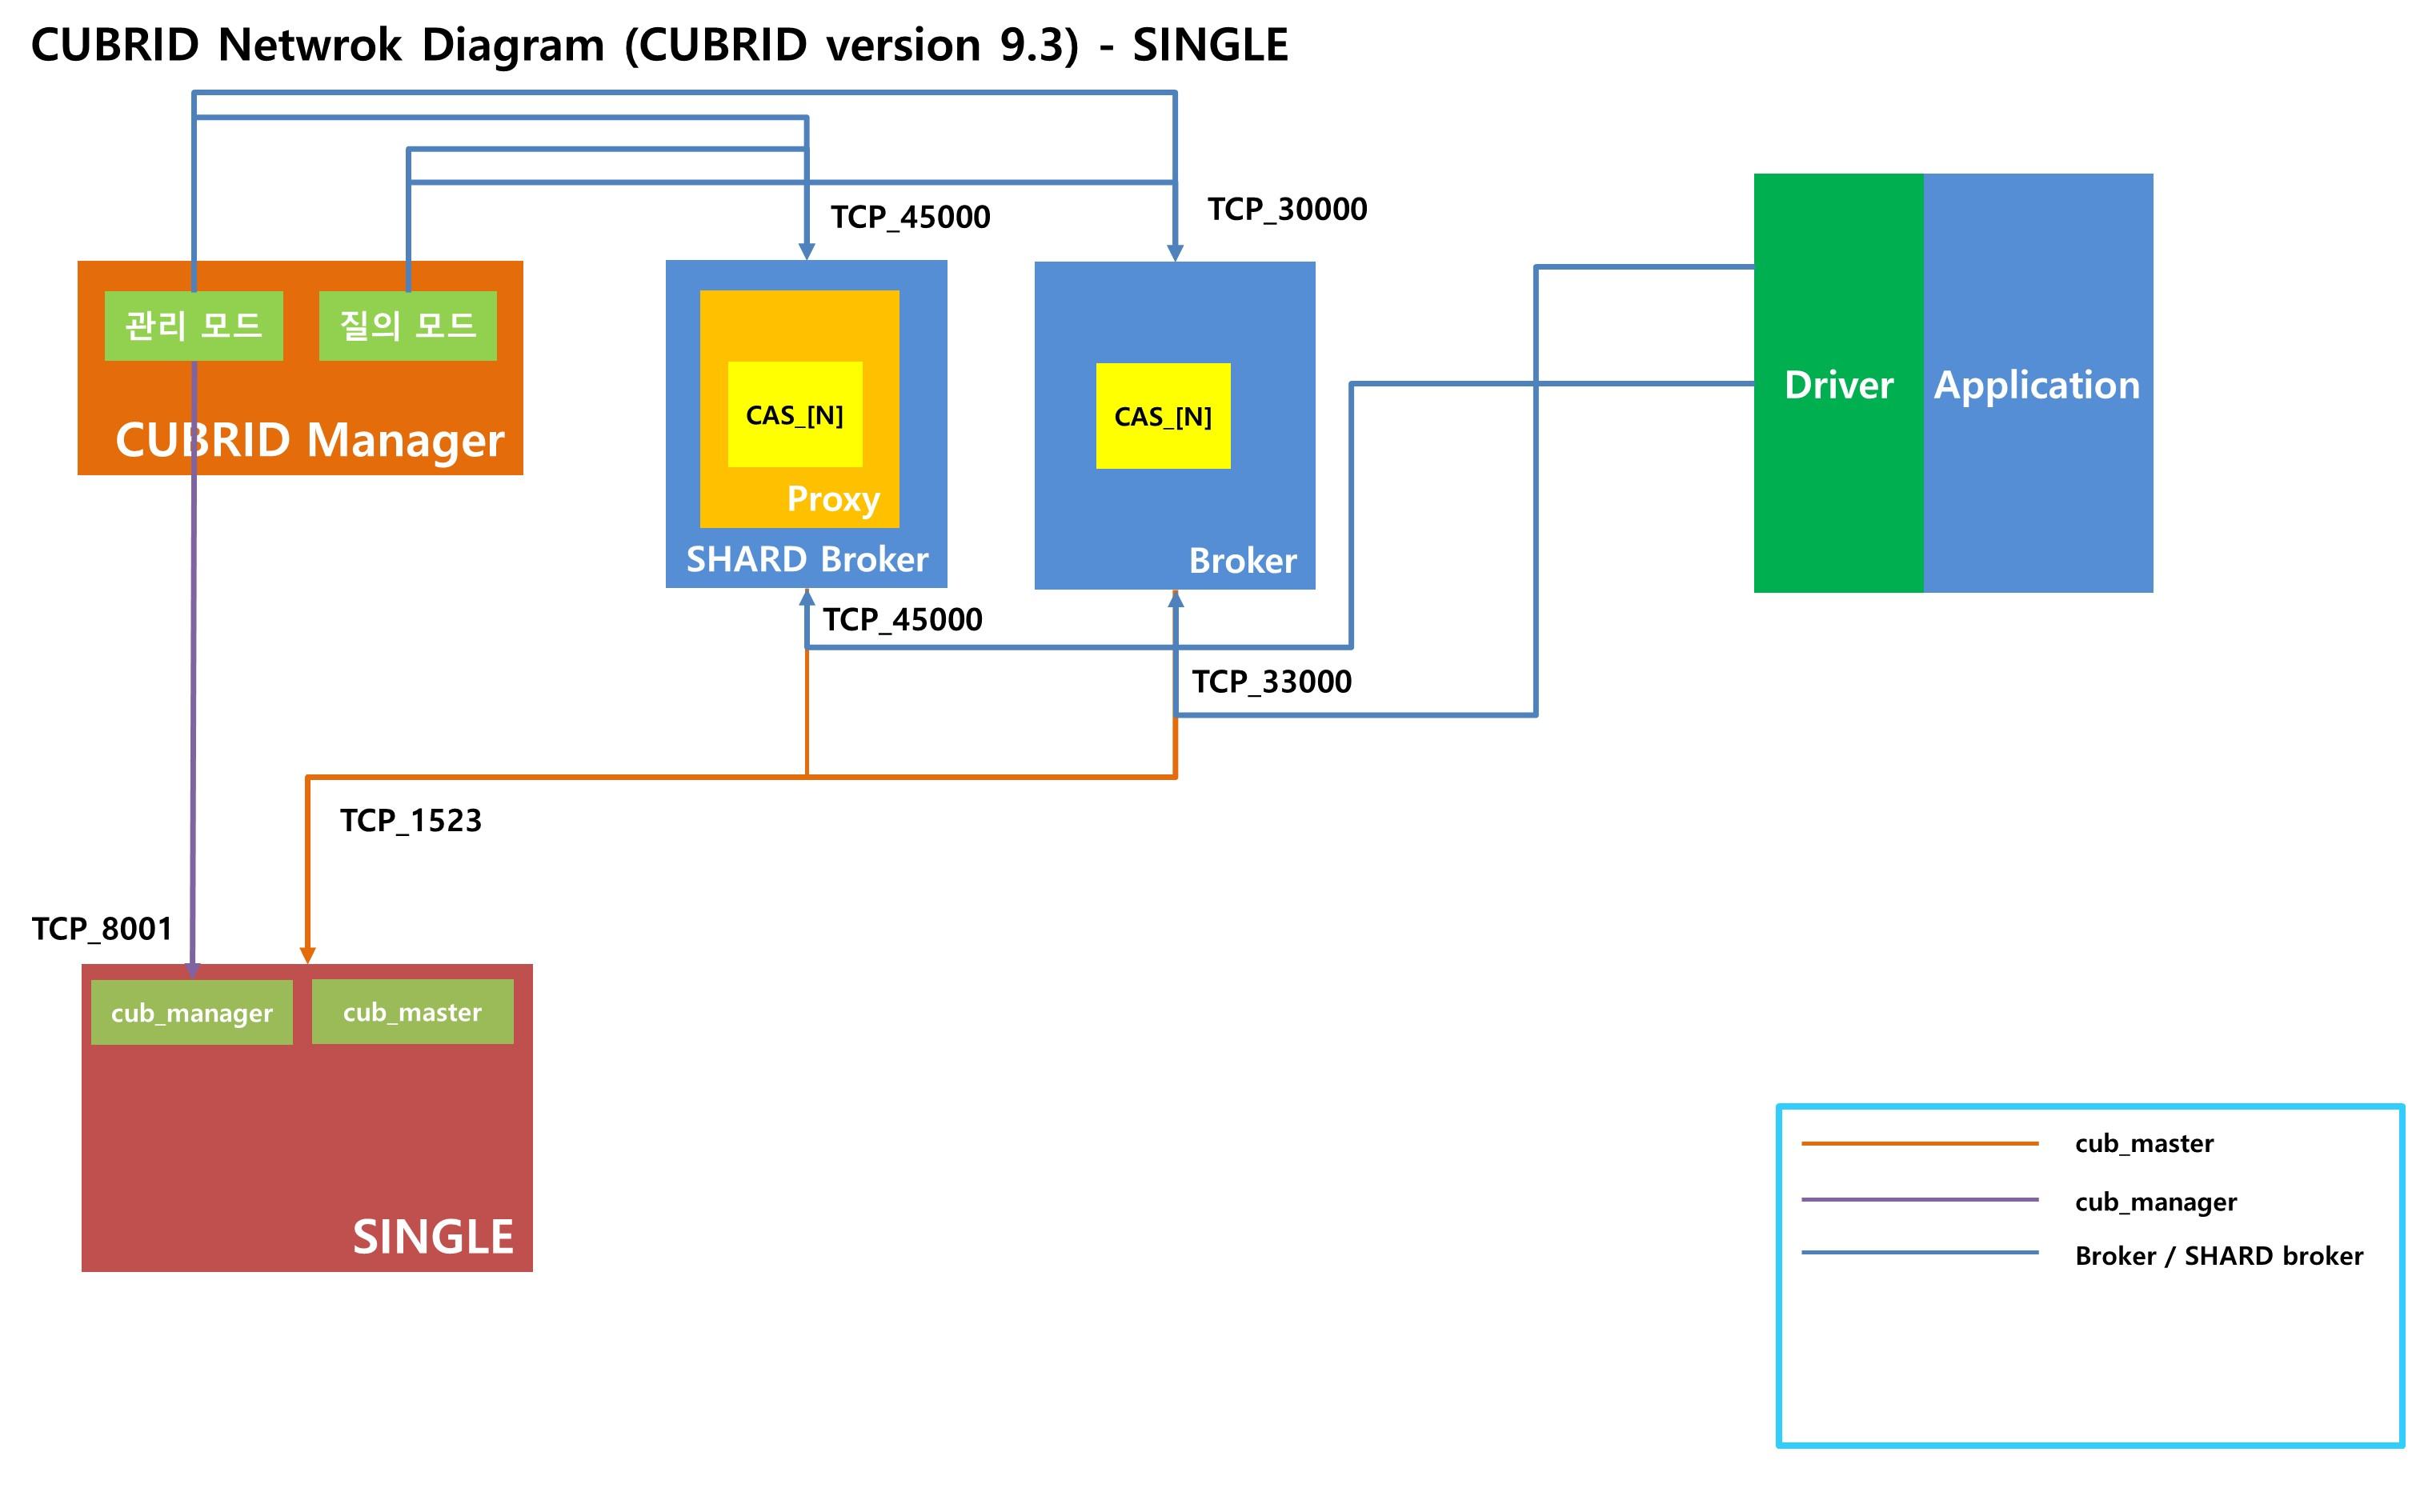 linux_93_single.jpg